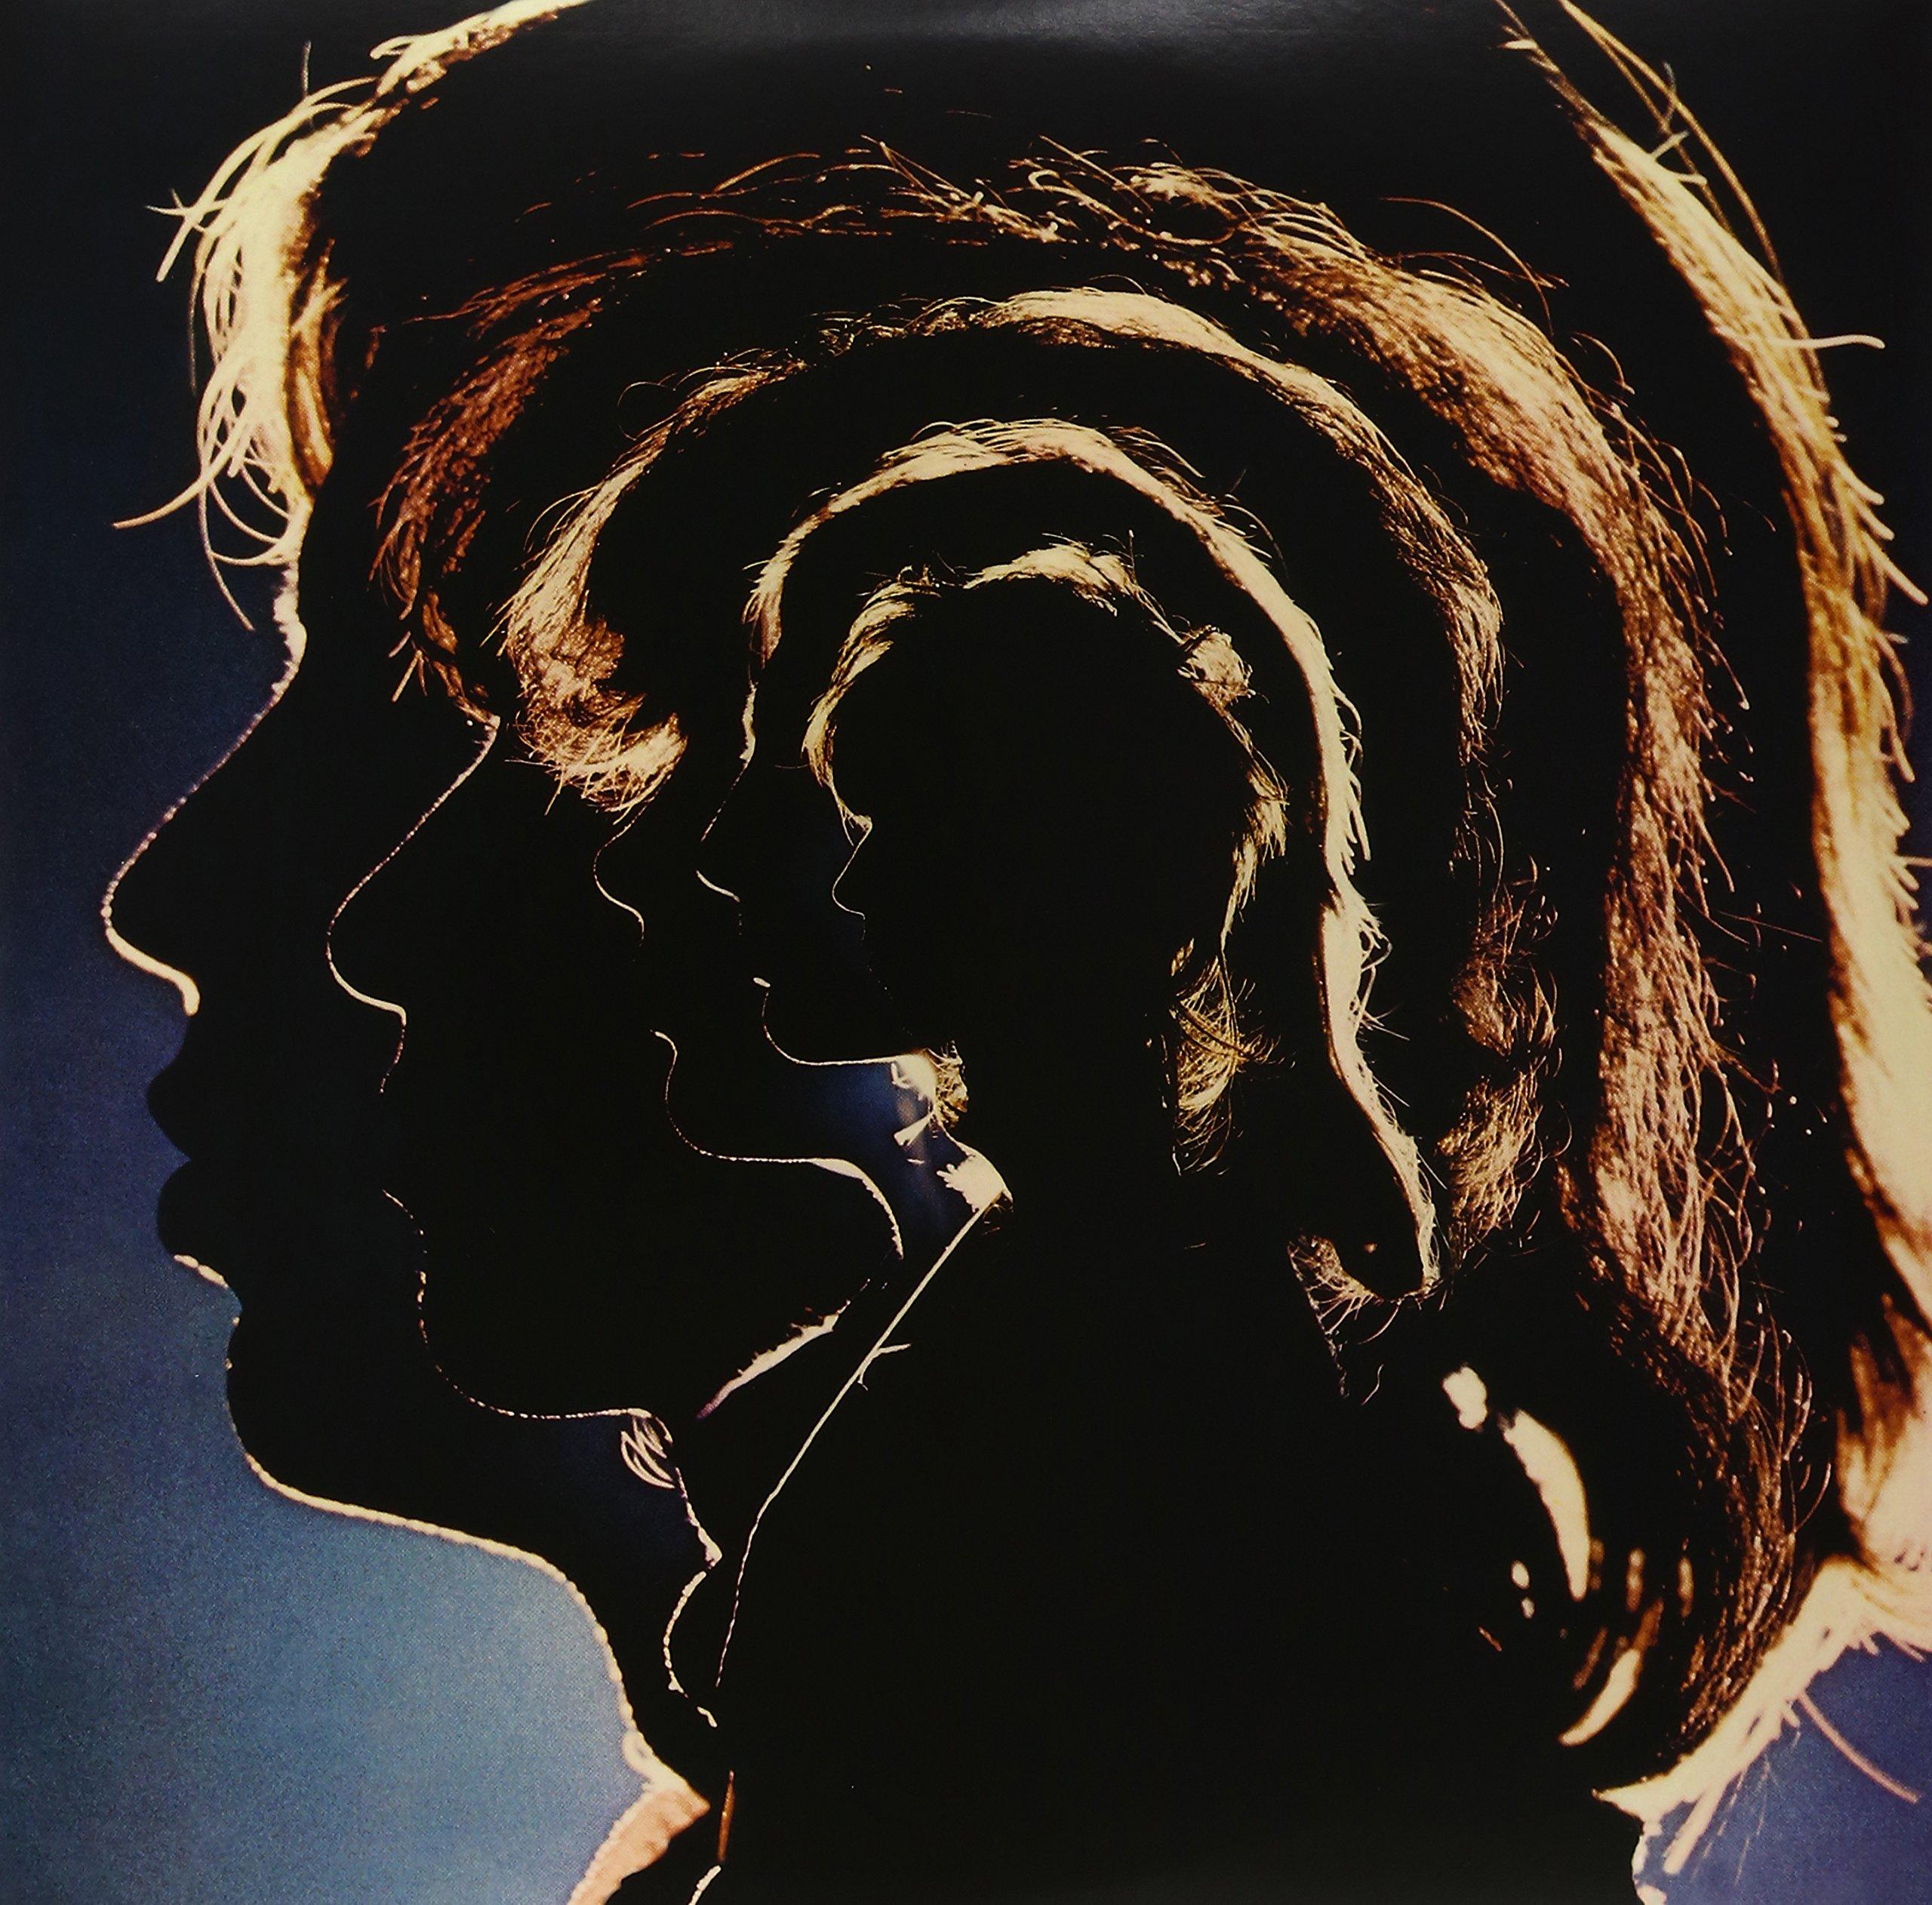 Hot Rocks, 1964-1971 [Vinyl] by UMGD-ABKCO